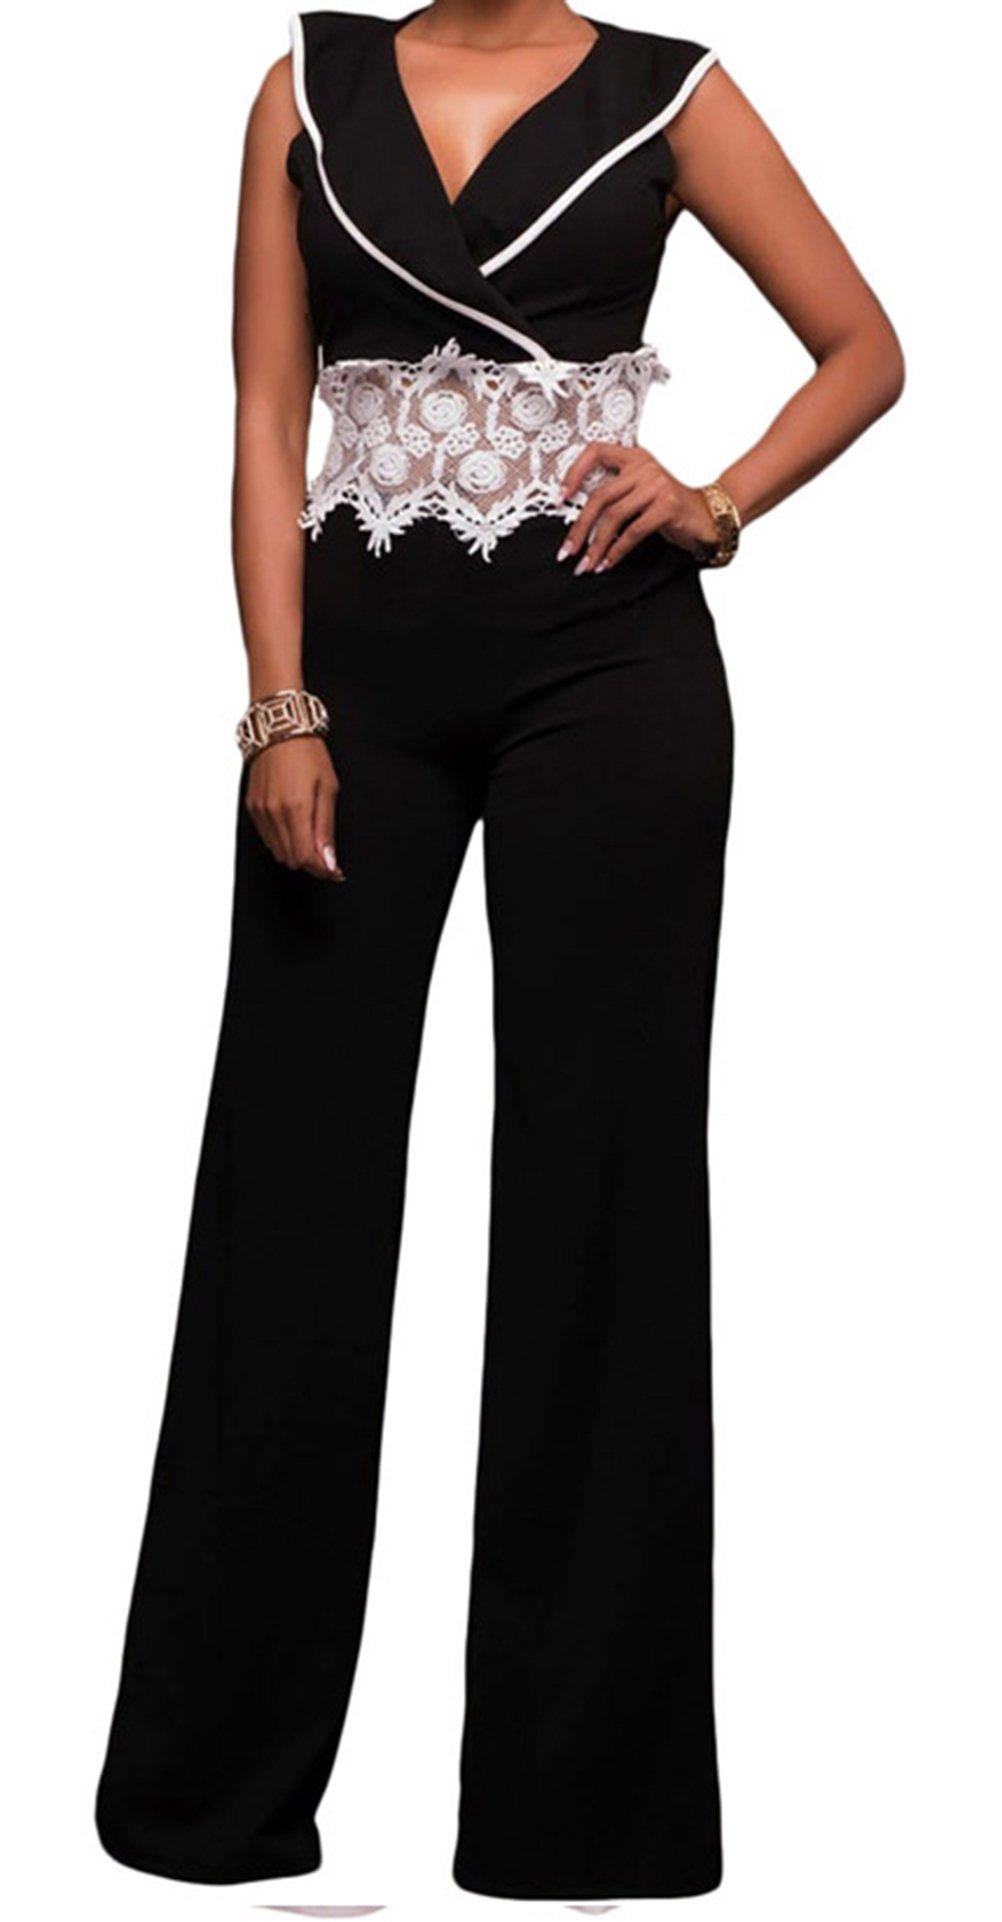 YFFaye Women's New Fashion Vogue Contrast Lace Waist Insert Black Wide Leg Jumpsuit Size L by YFFaye